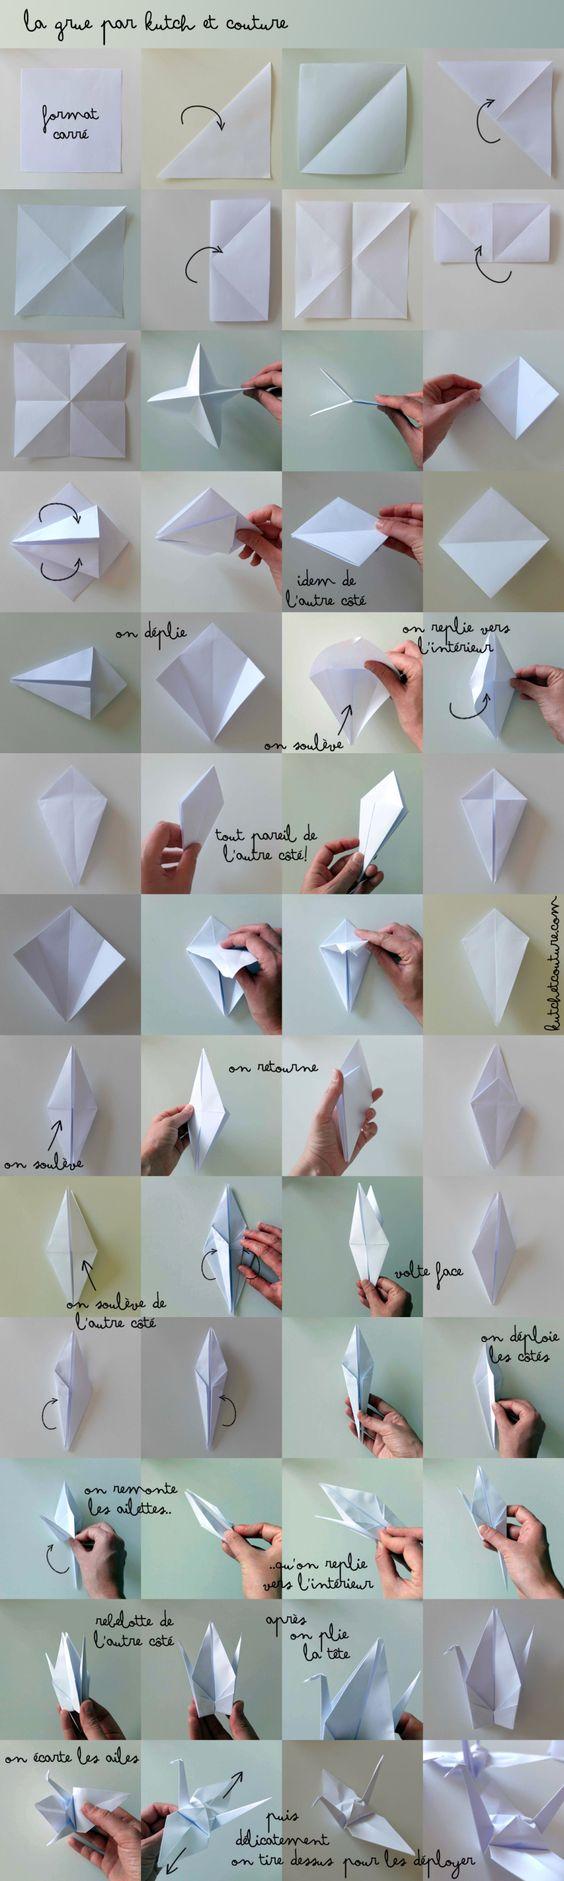 origami distance and mobiles on pinterest. Black Bedroom Furniture Sets. Home Design Ideas